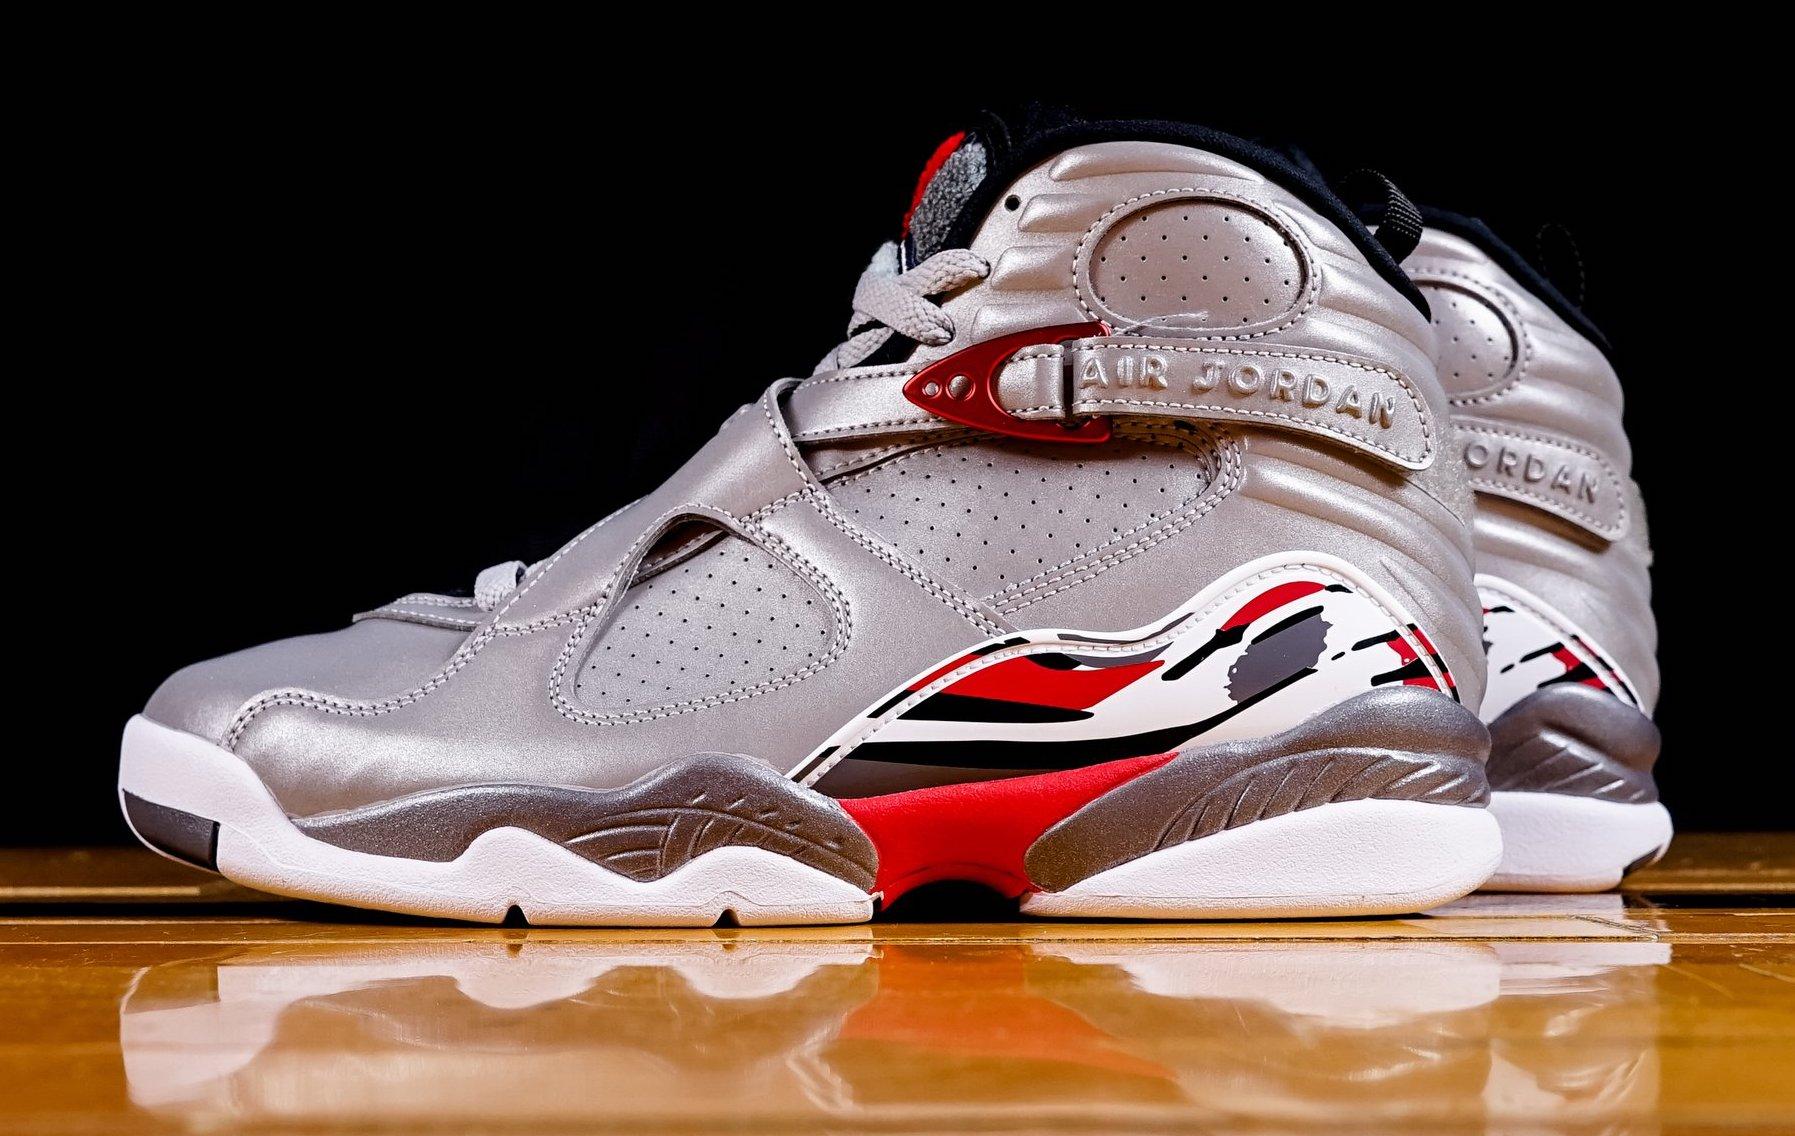 Air Jordan 8 Reflections of a Champion